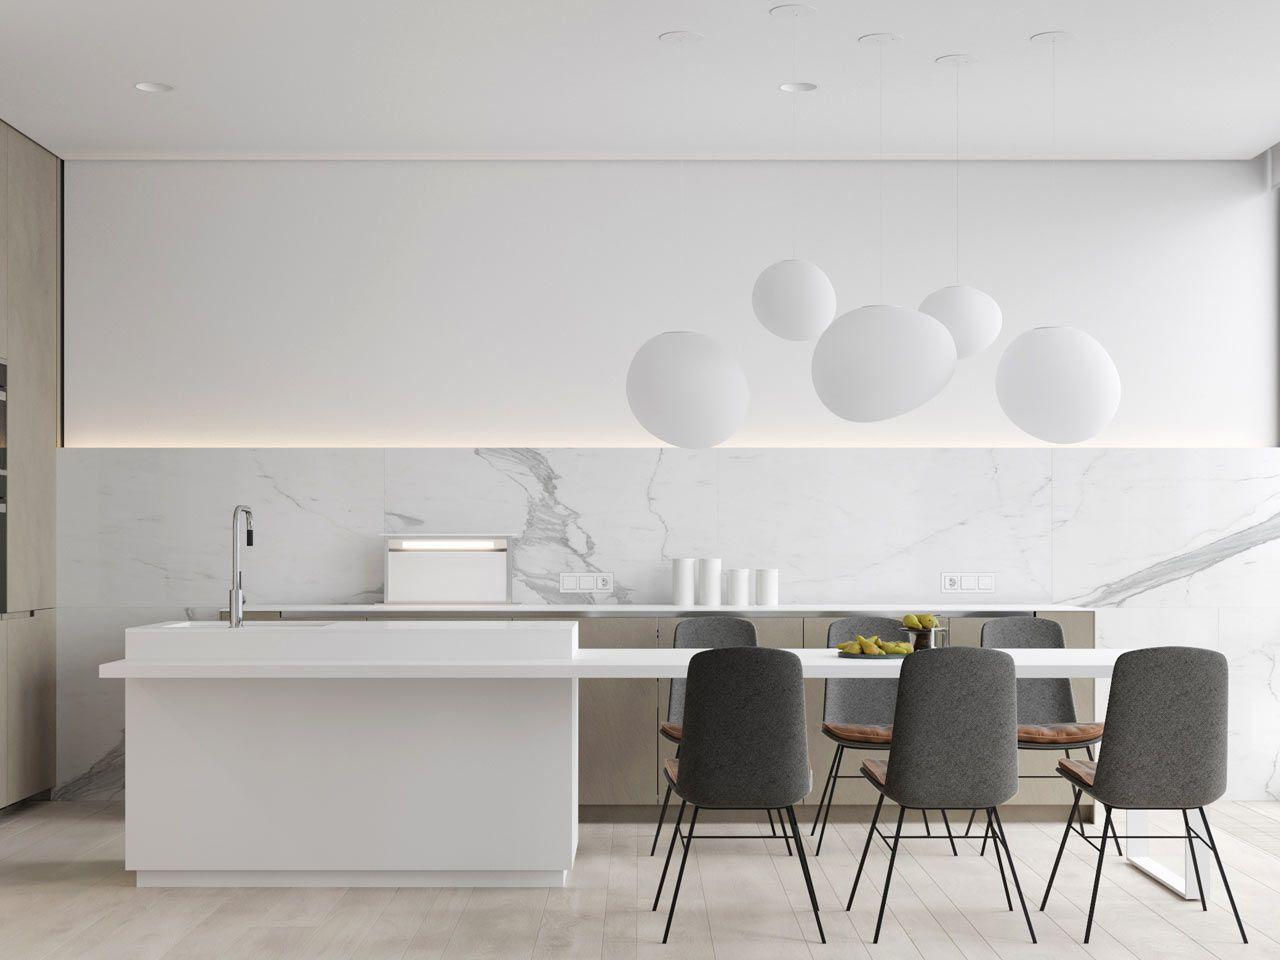 Home interior design farbkombinationen bachelorapartmentm  küche  pinterest  apartments kitchens